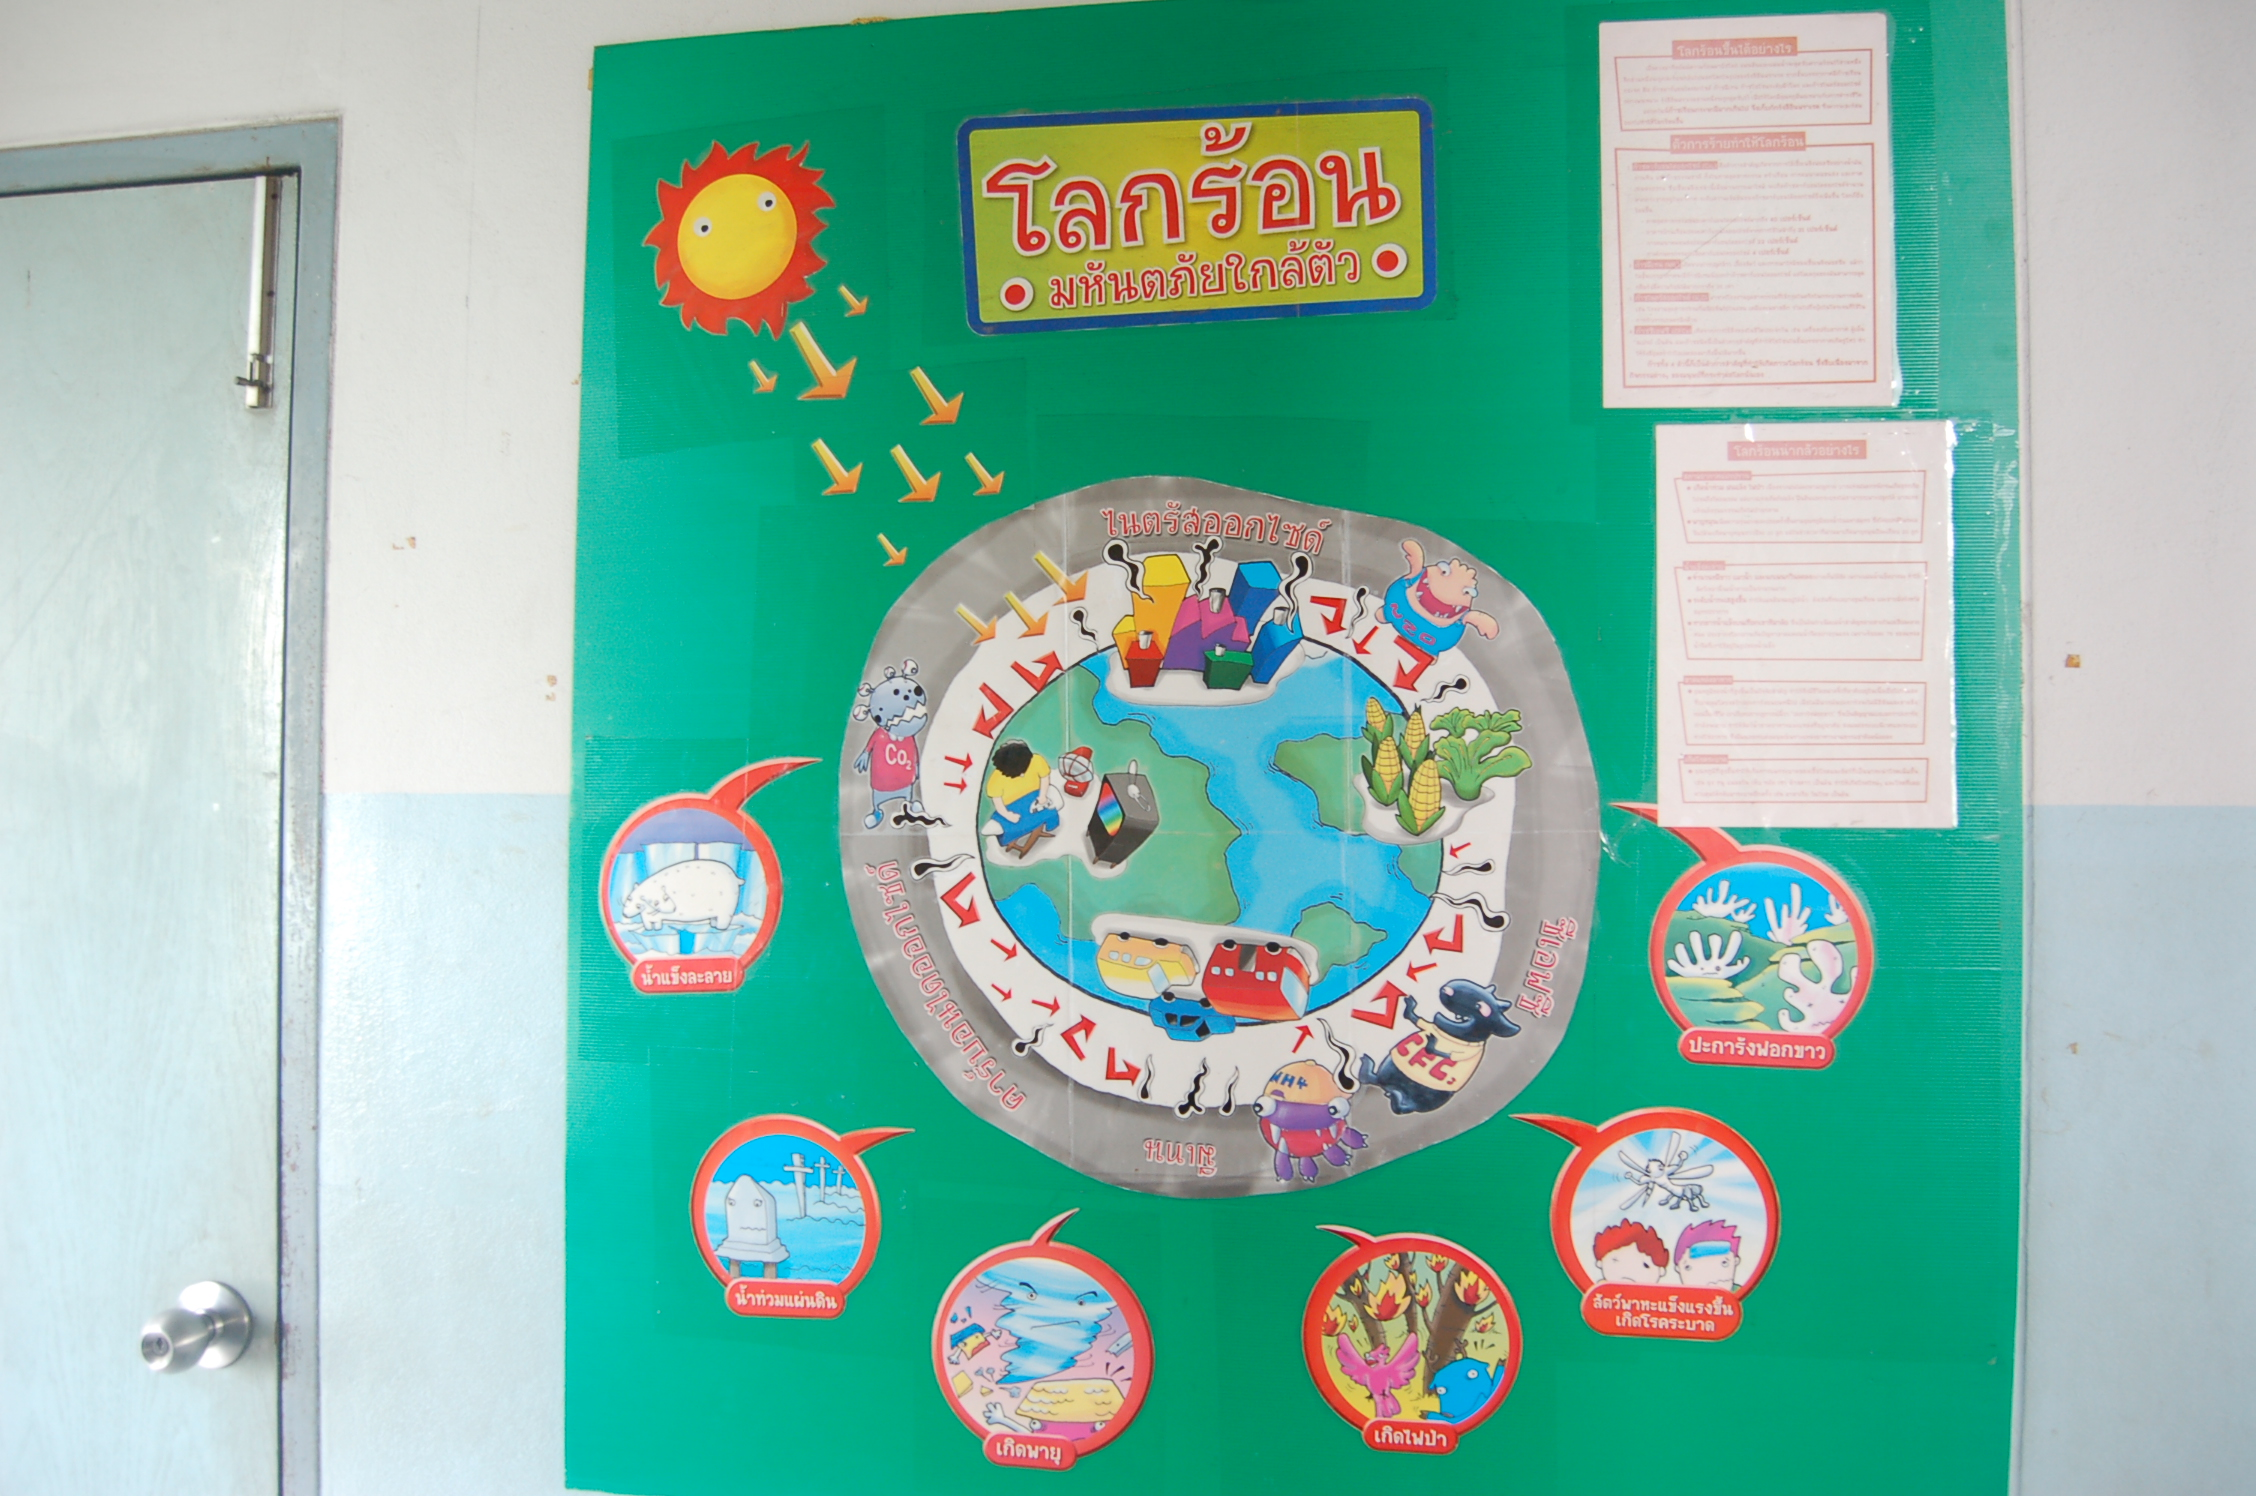 Rachineeburana School Activities On World Environment